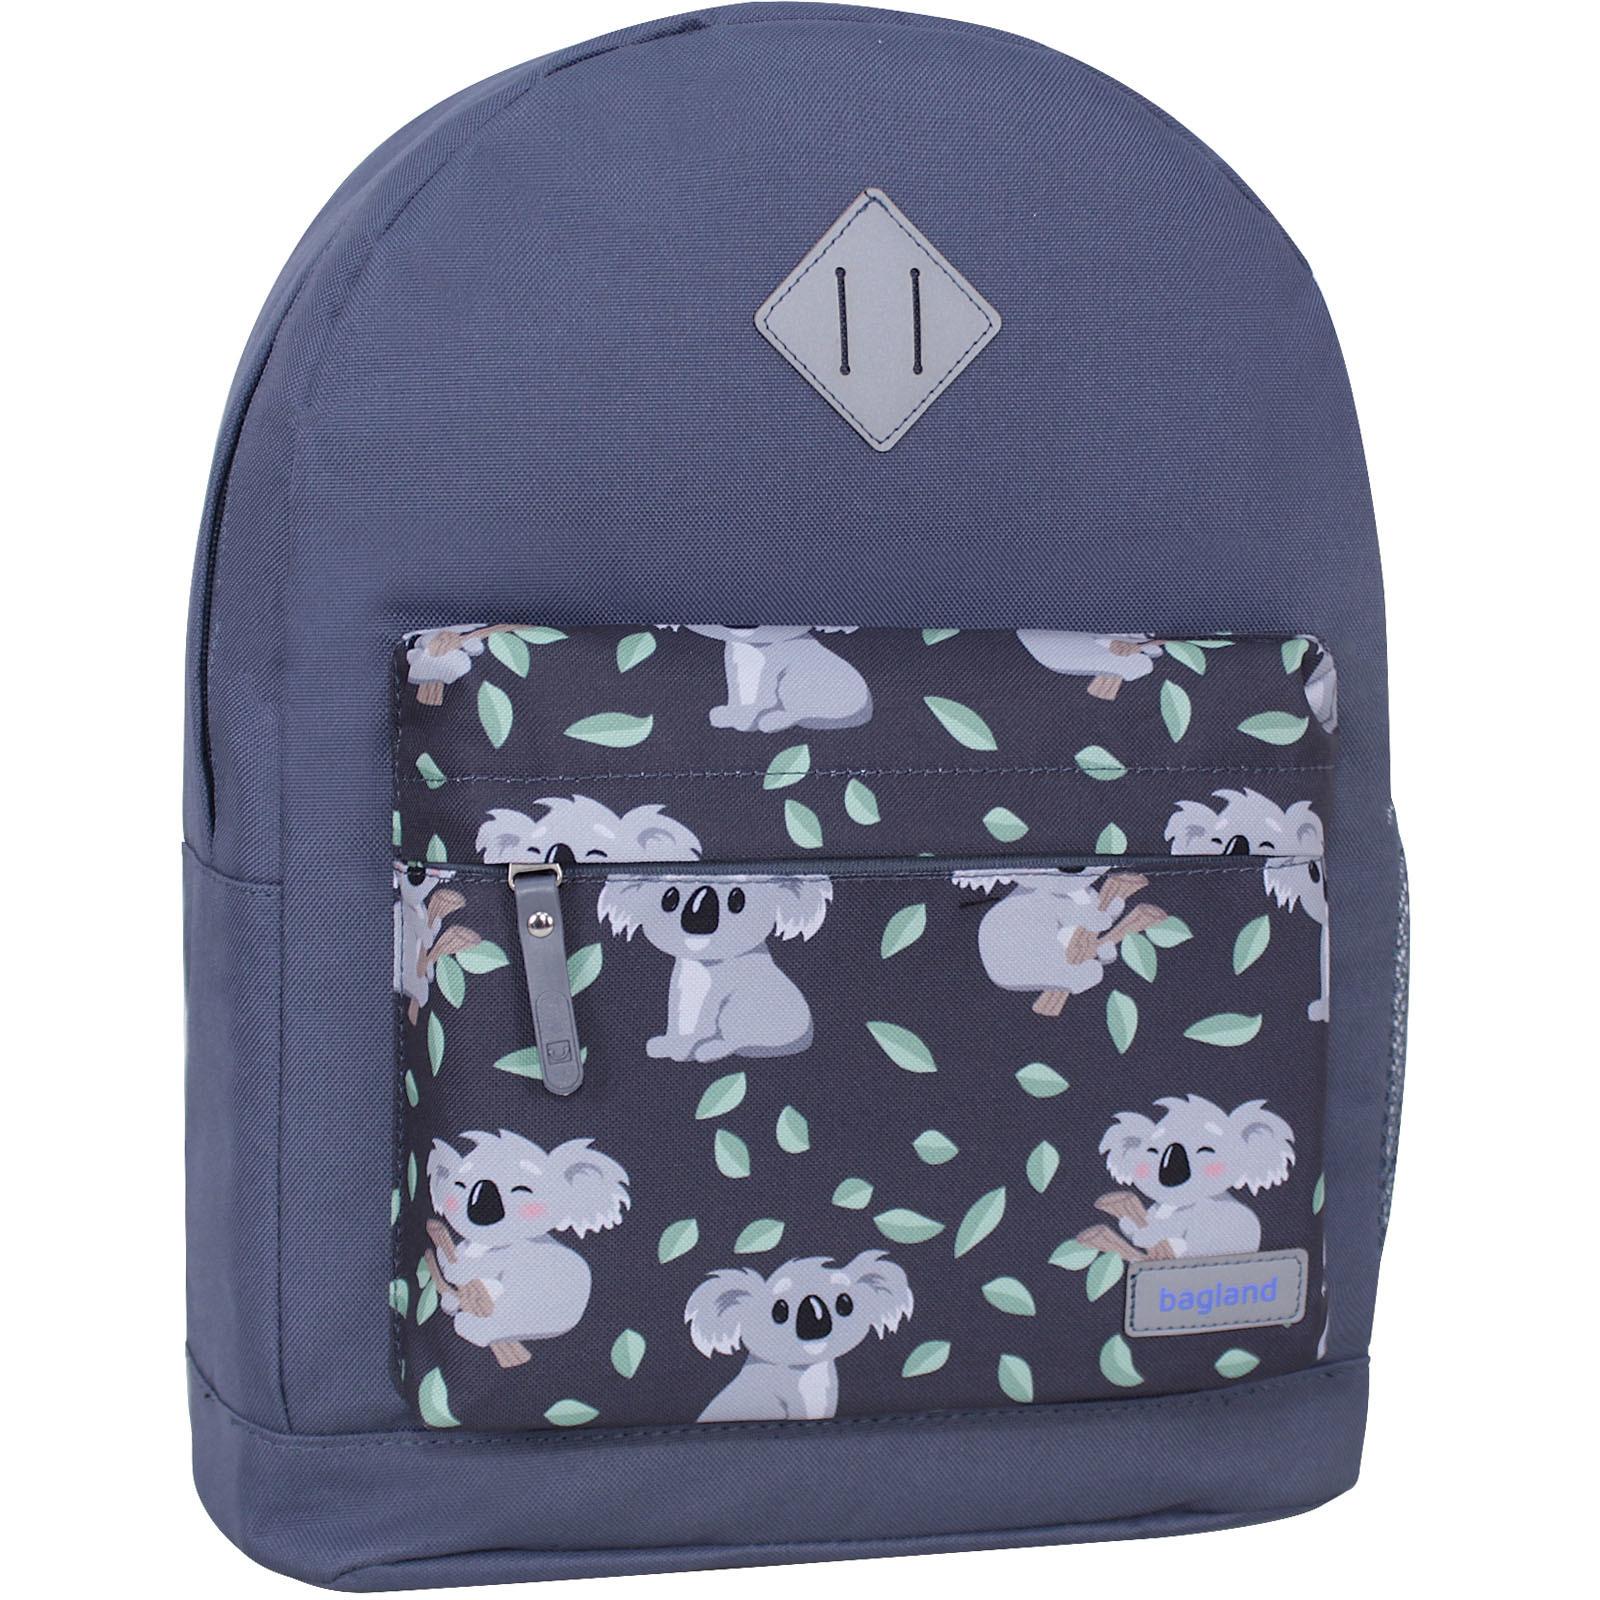 Женские рюкзаки Рюкзак Bagland Молодежный W/R 17 л. Серый 990 (00533662) IMG_1017__суб.990_.jpg